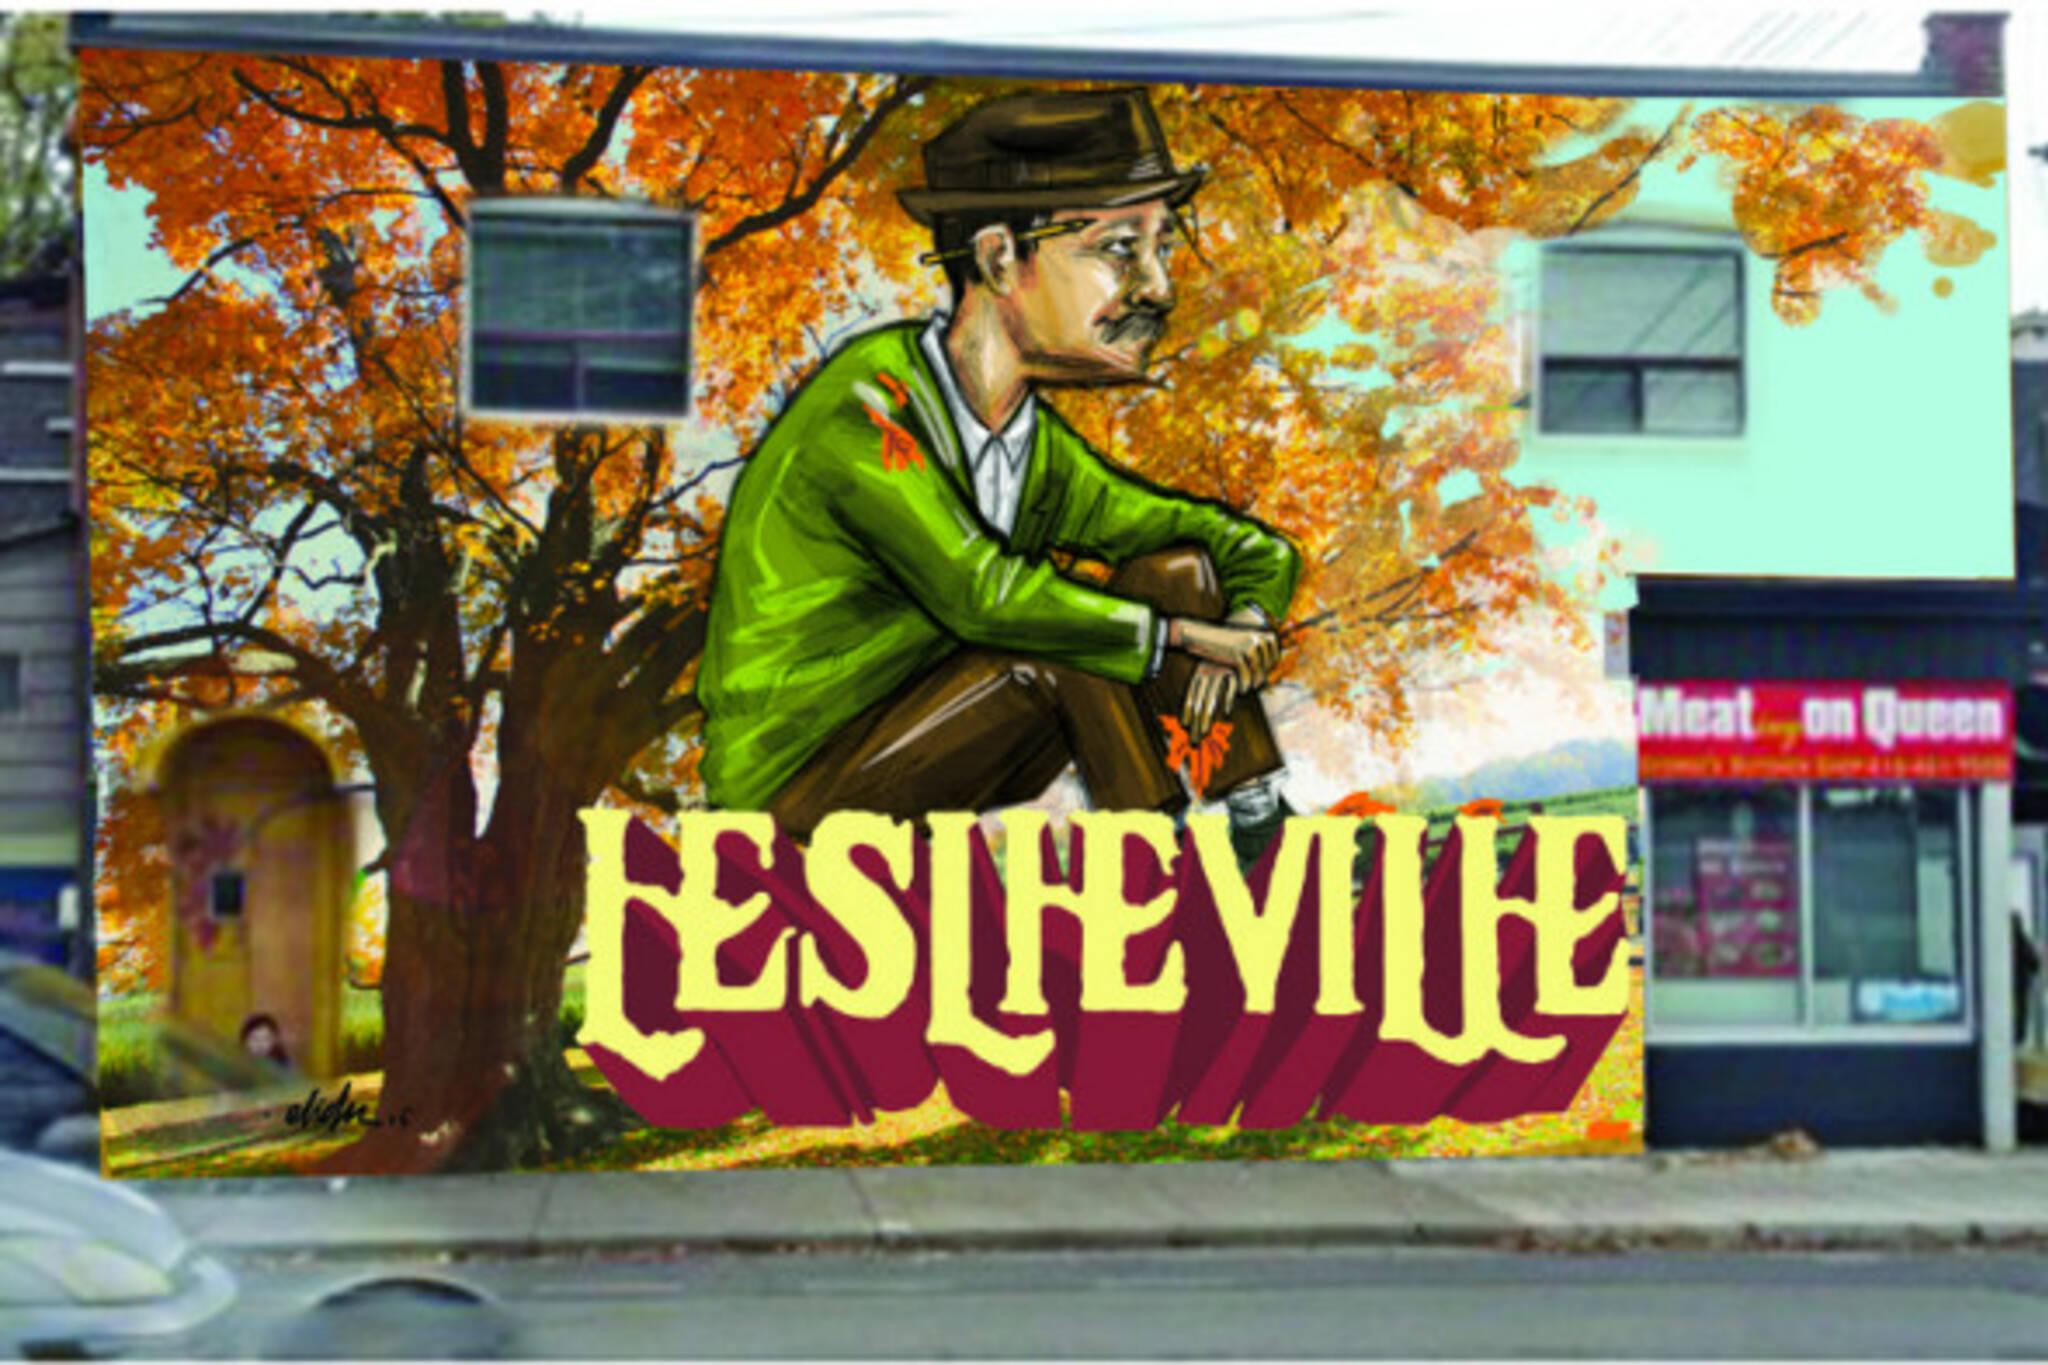 Toronto Leslieville mural